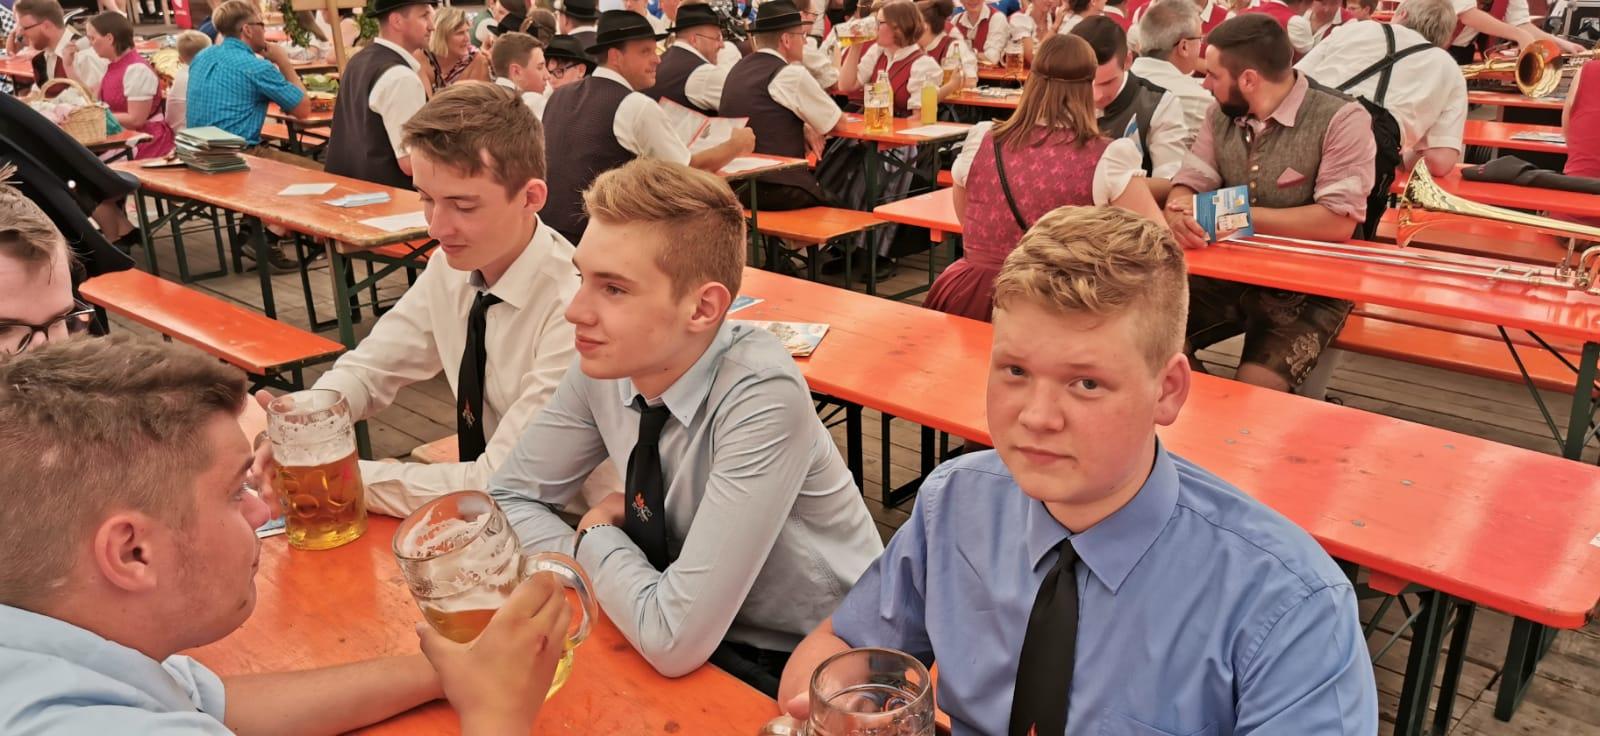 Volksfest 2019 – Im Festzelt.